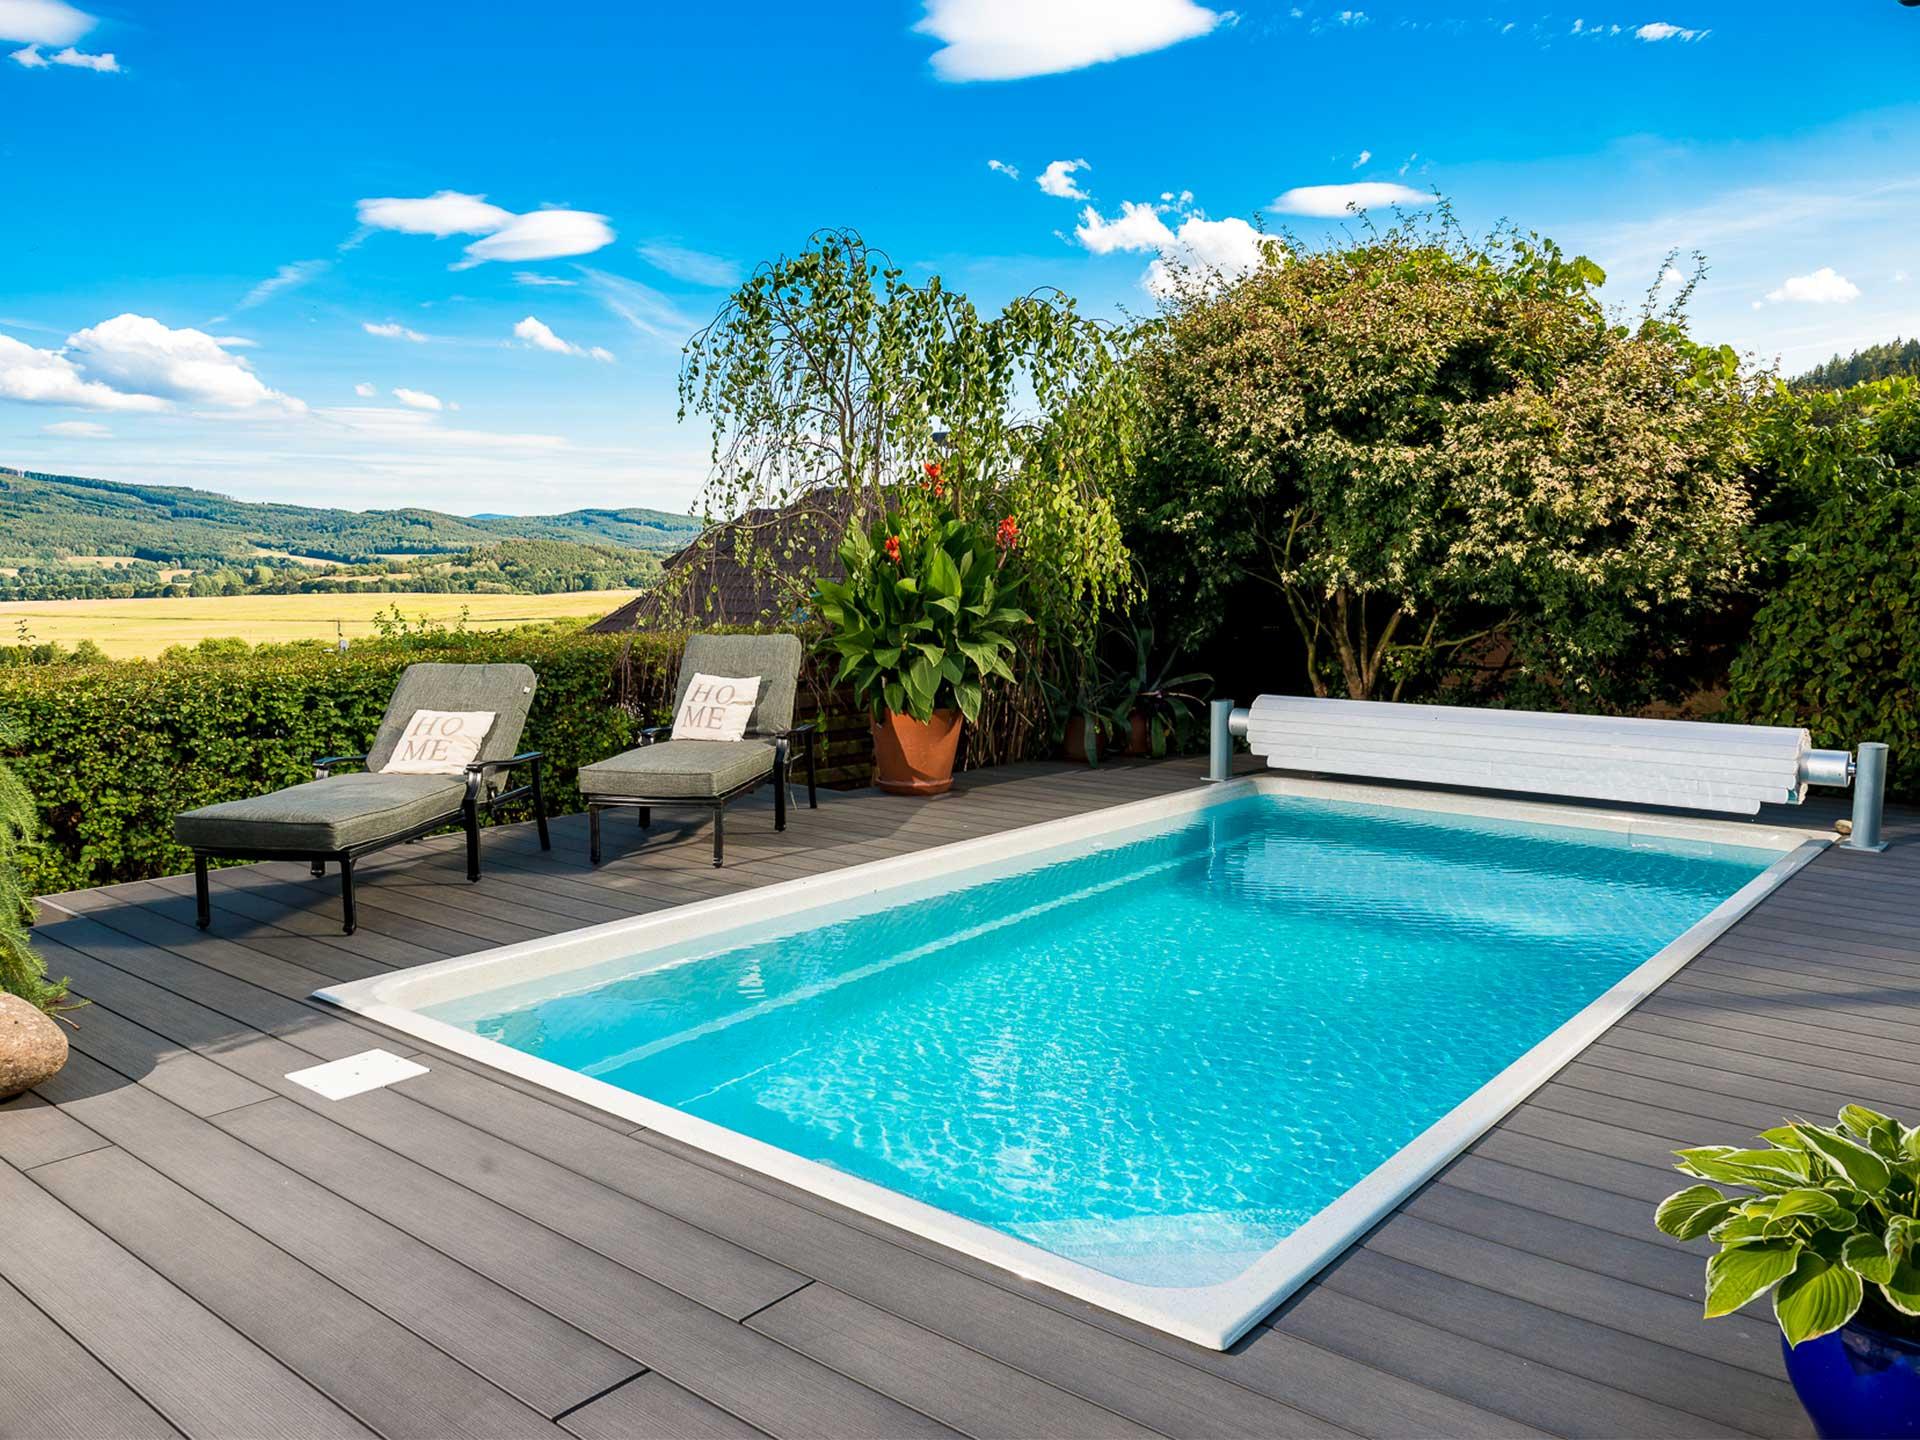 Upoolia Pool